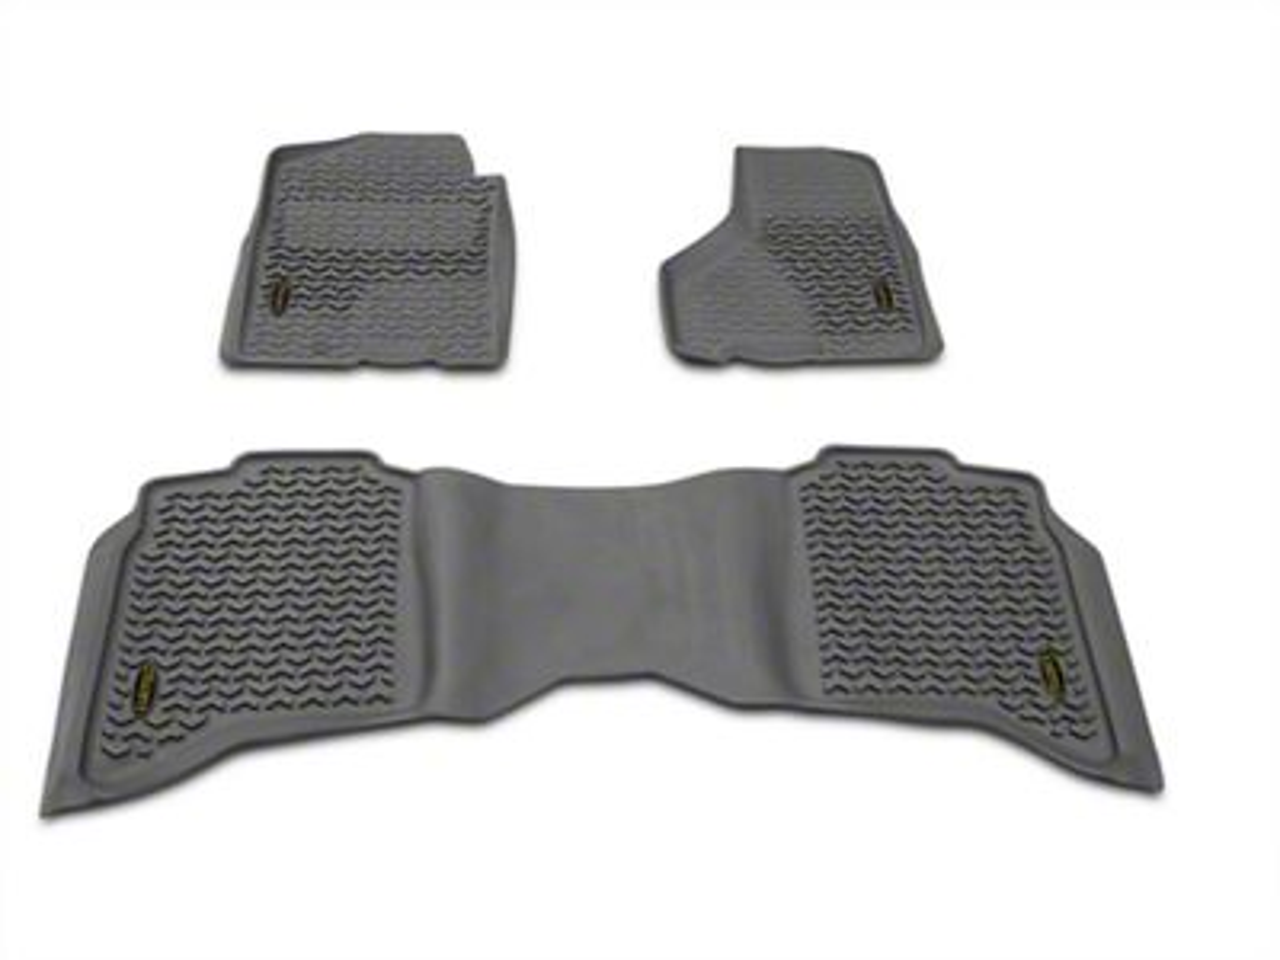 Barricade Front & Rear Floor Liners - Gray (09-18 RAM 1500 Crew Cab)